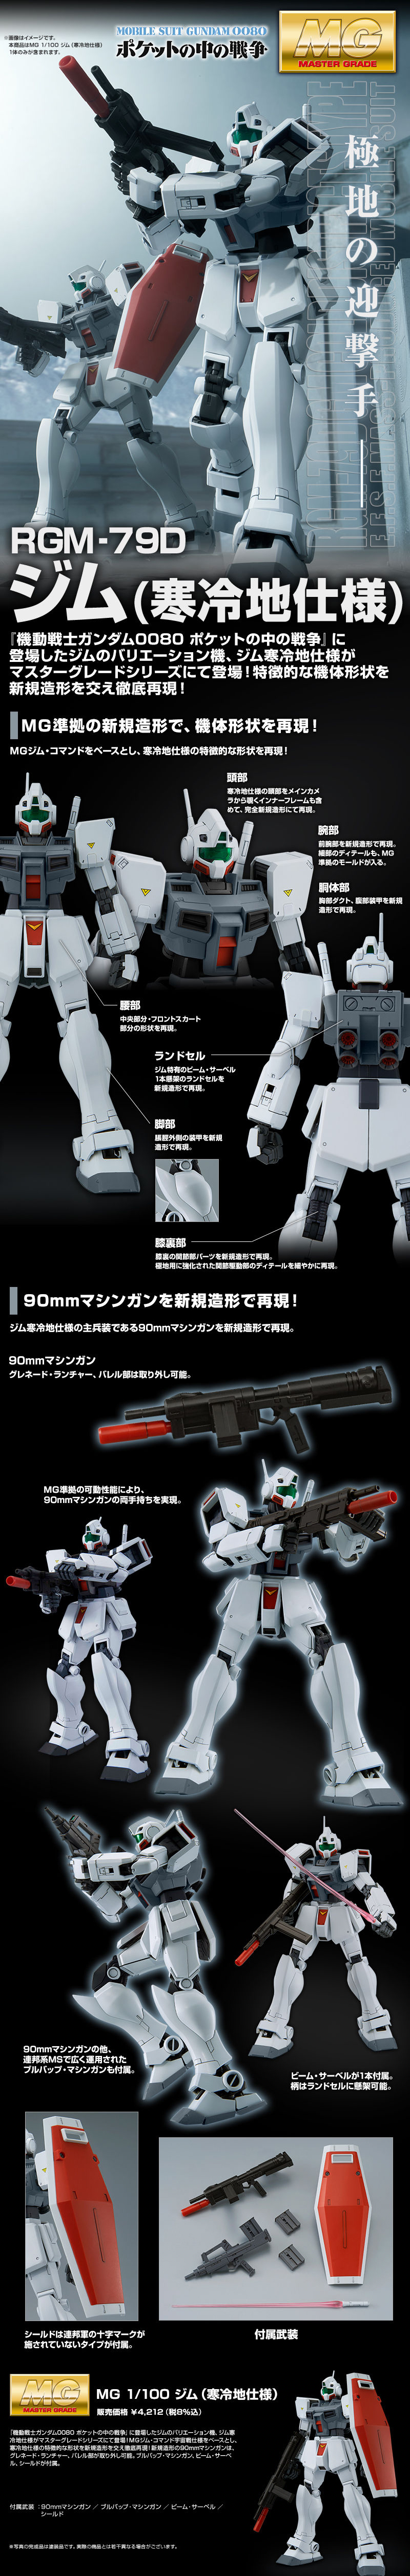 MG 1/100 ジム(寒冷地仕様) 公式商品説明(画像)